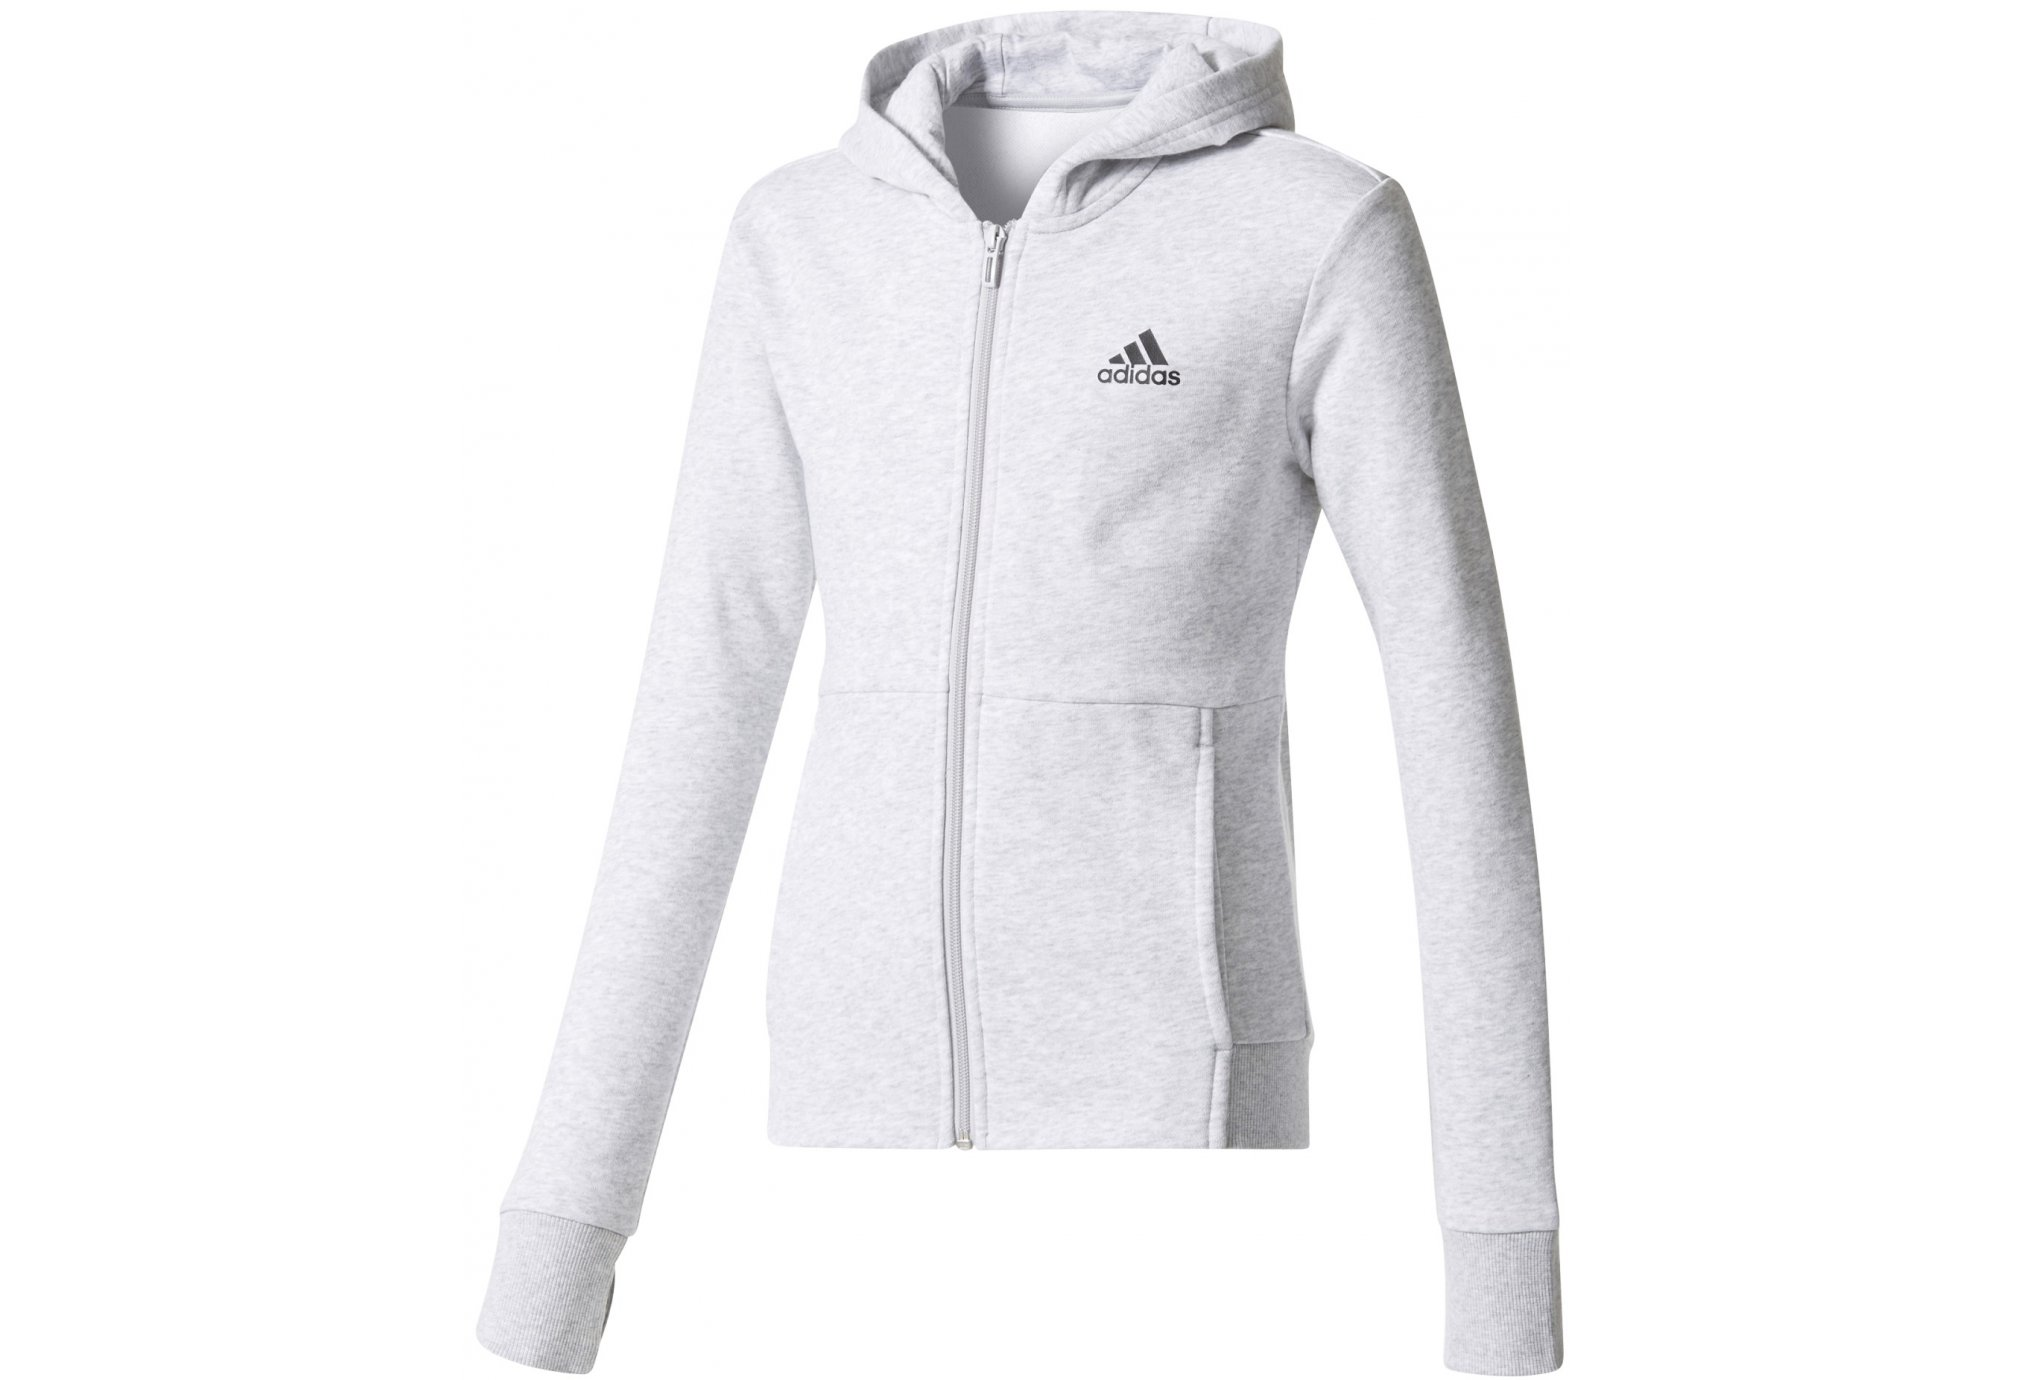 release date: 672cb 9cebc adidas vetement running,Adidas Survetement Coton Capuche Noir et Orange  vetement de sport pas cher vetement running homme